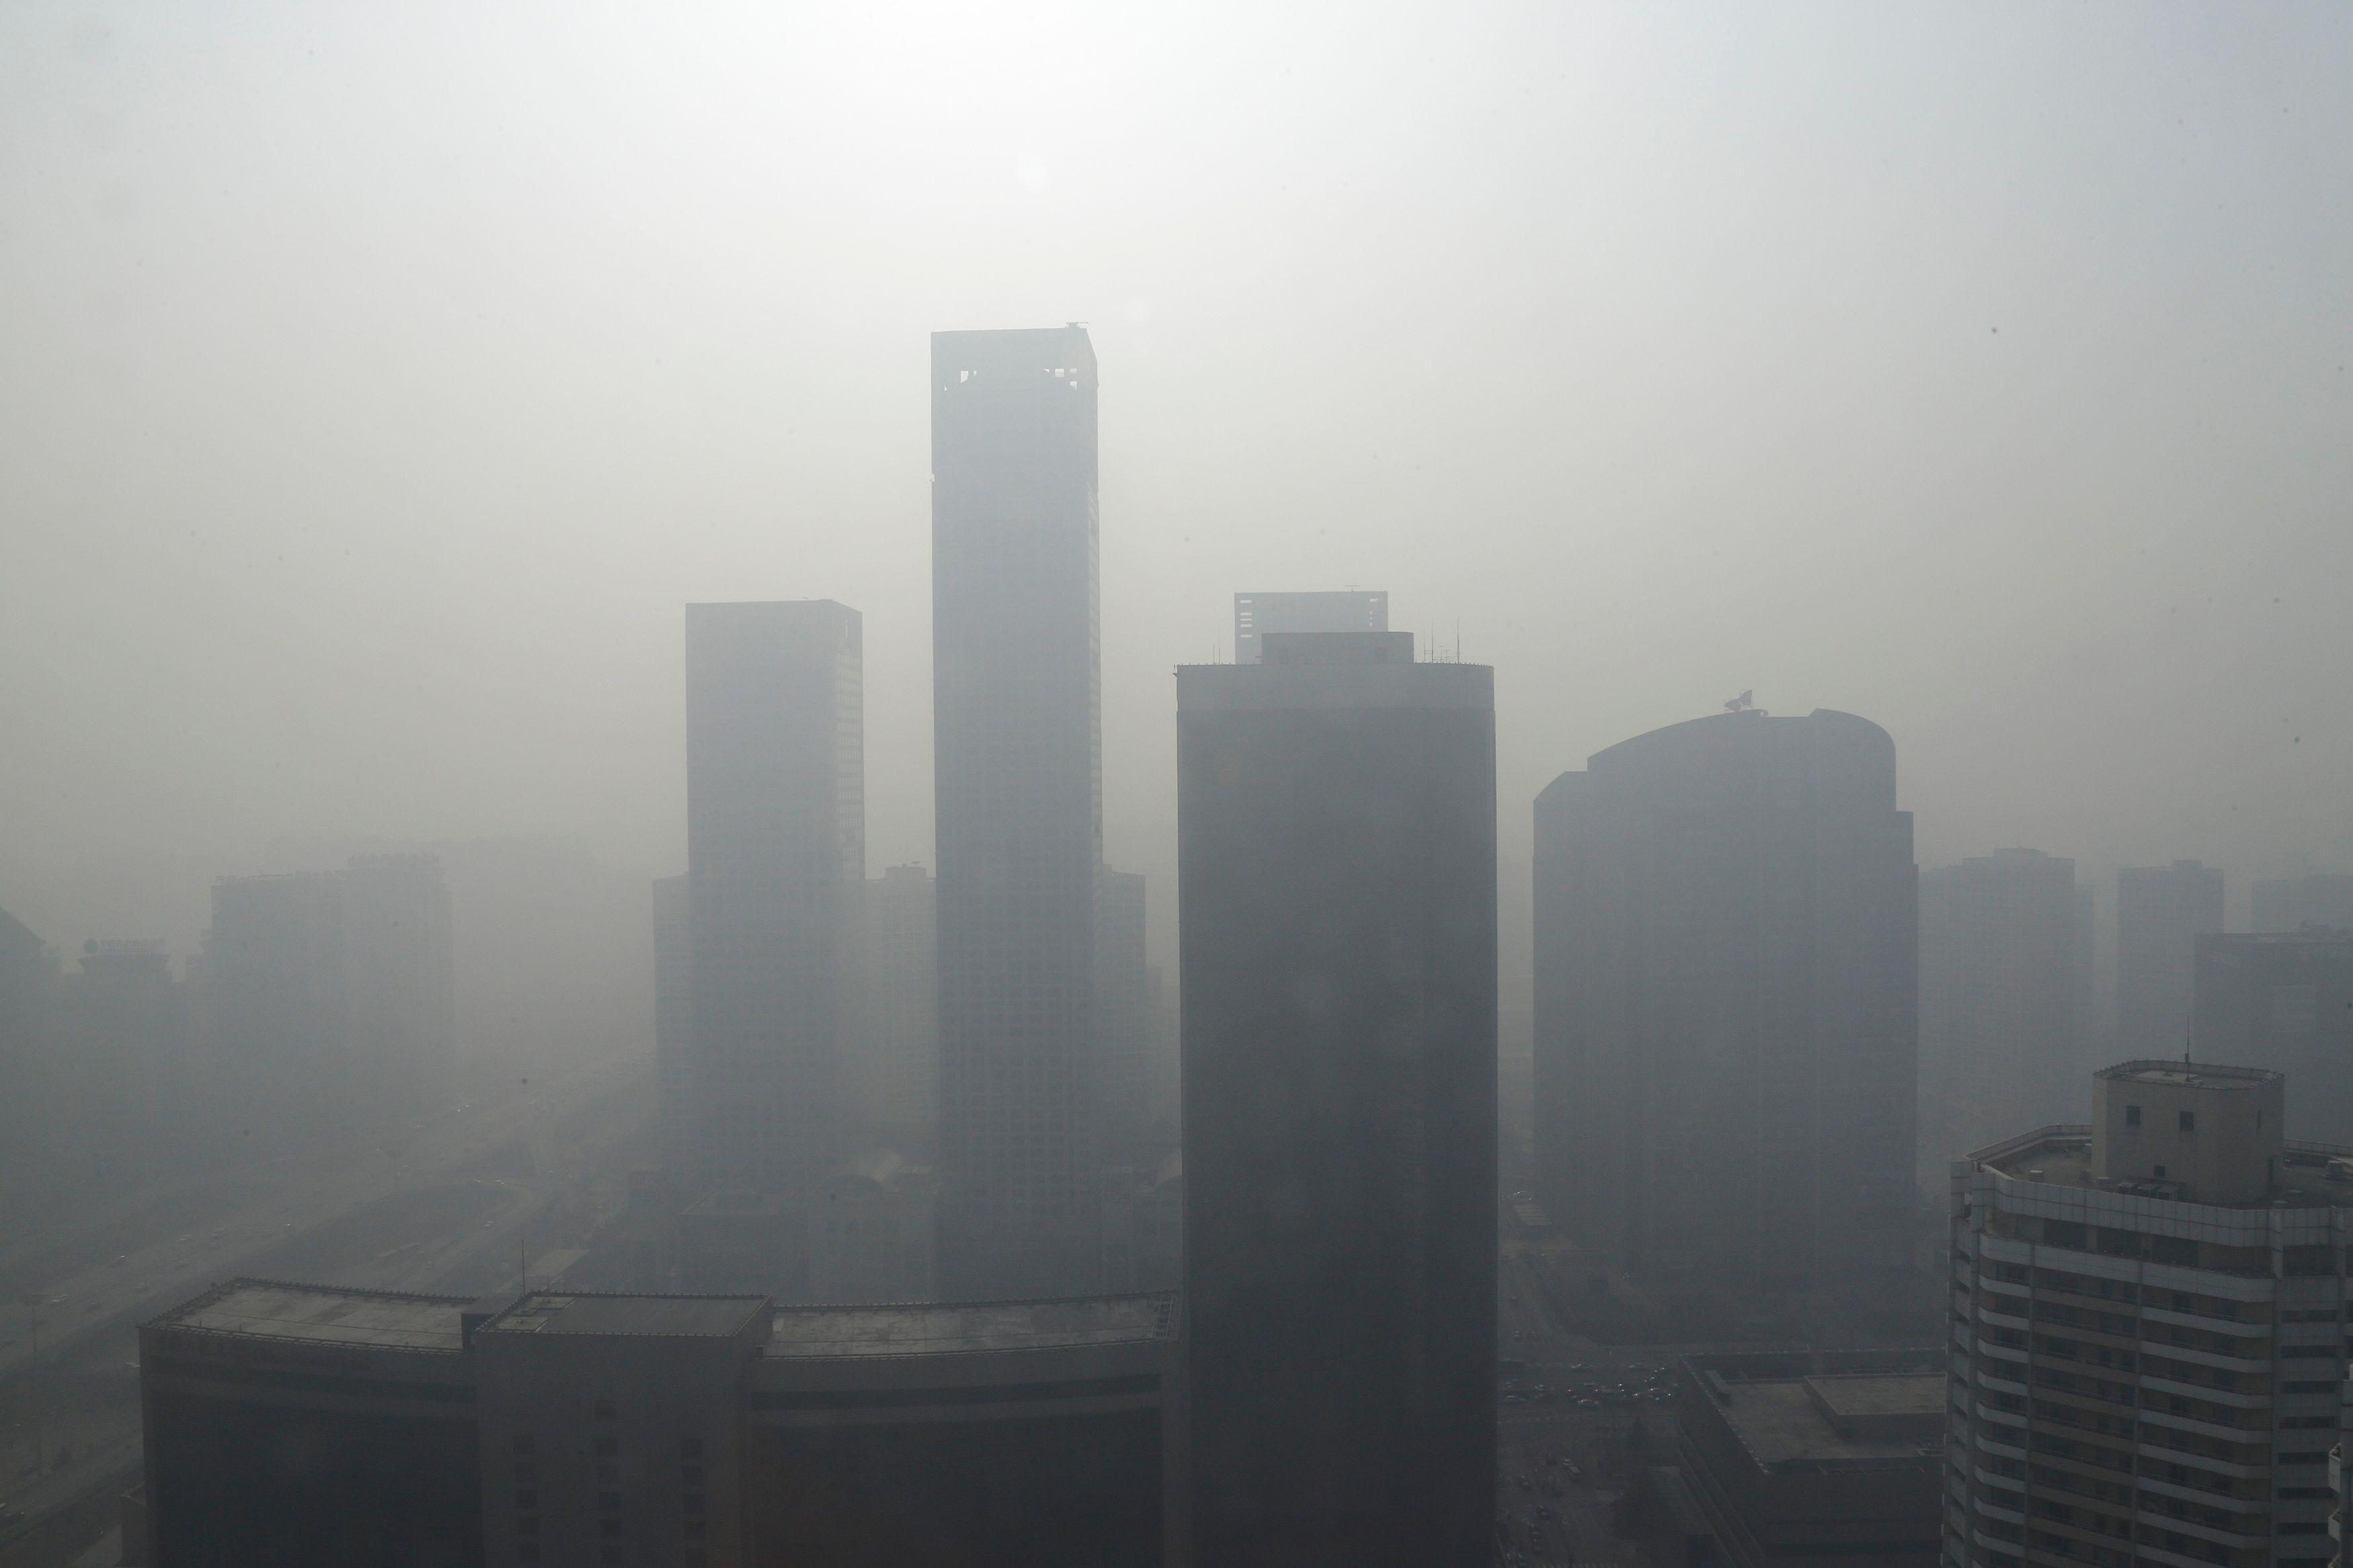 Le brouillard de pollution inquiète